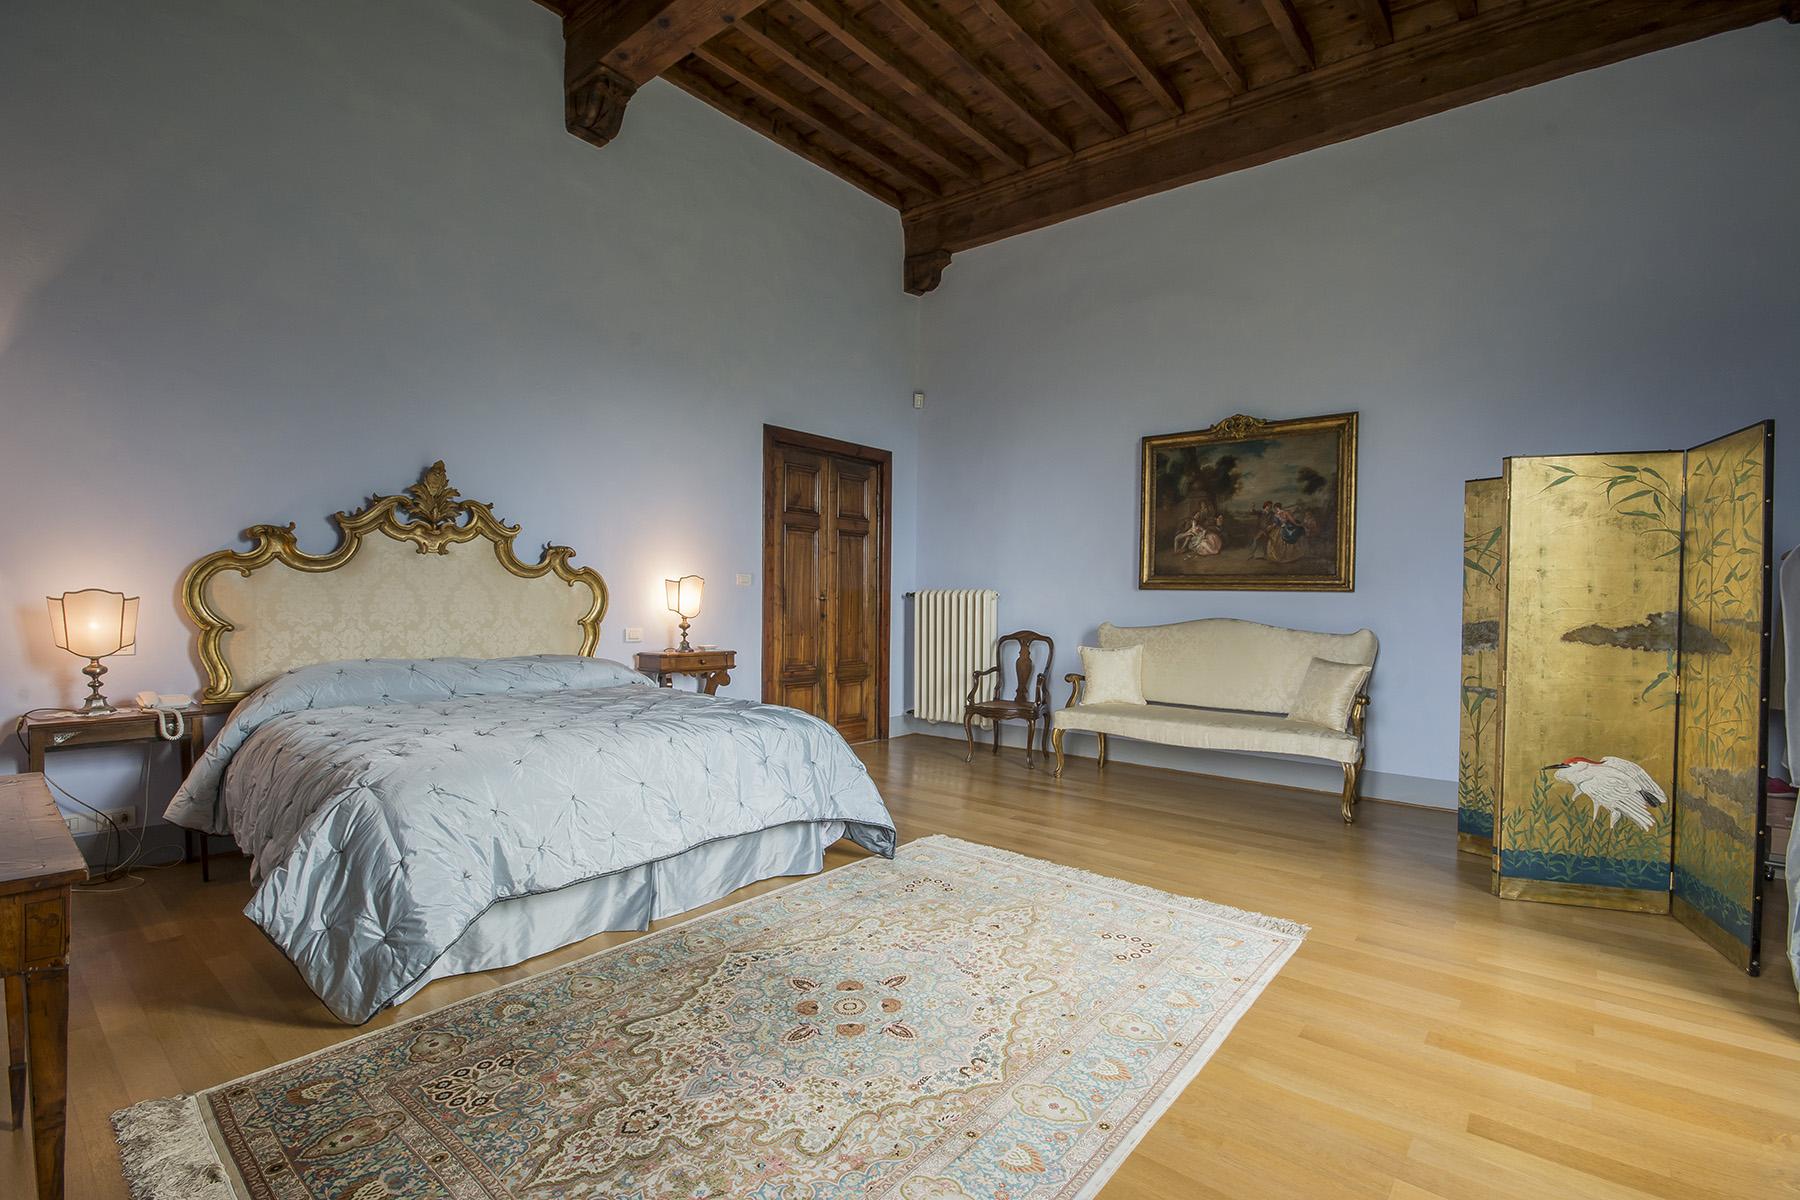 Villa in Vendita a Lucca: 5 locali, 1200 mq - Foto 15